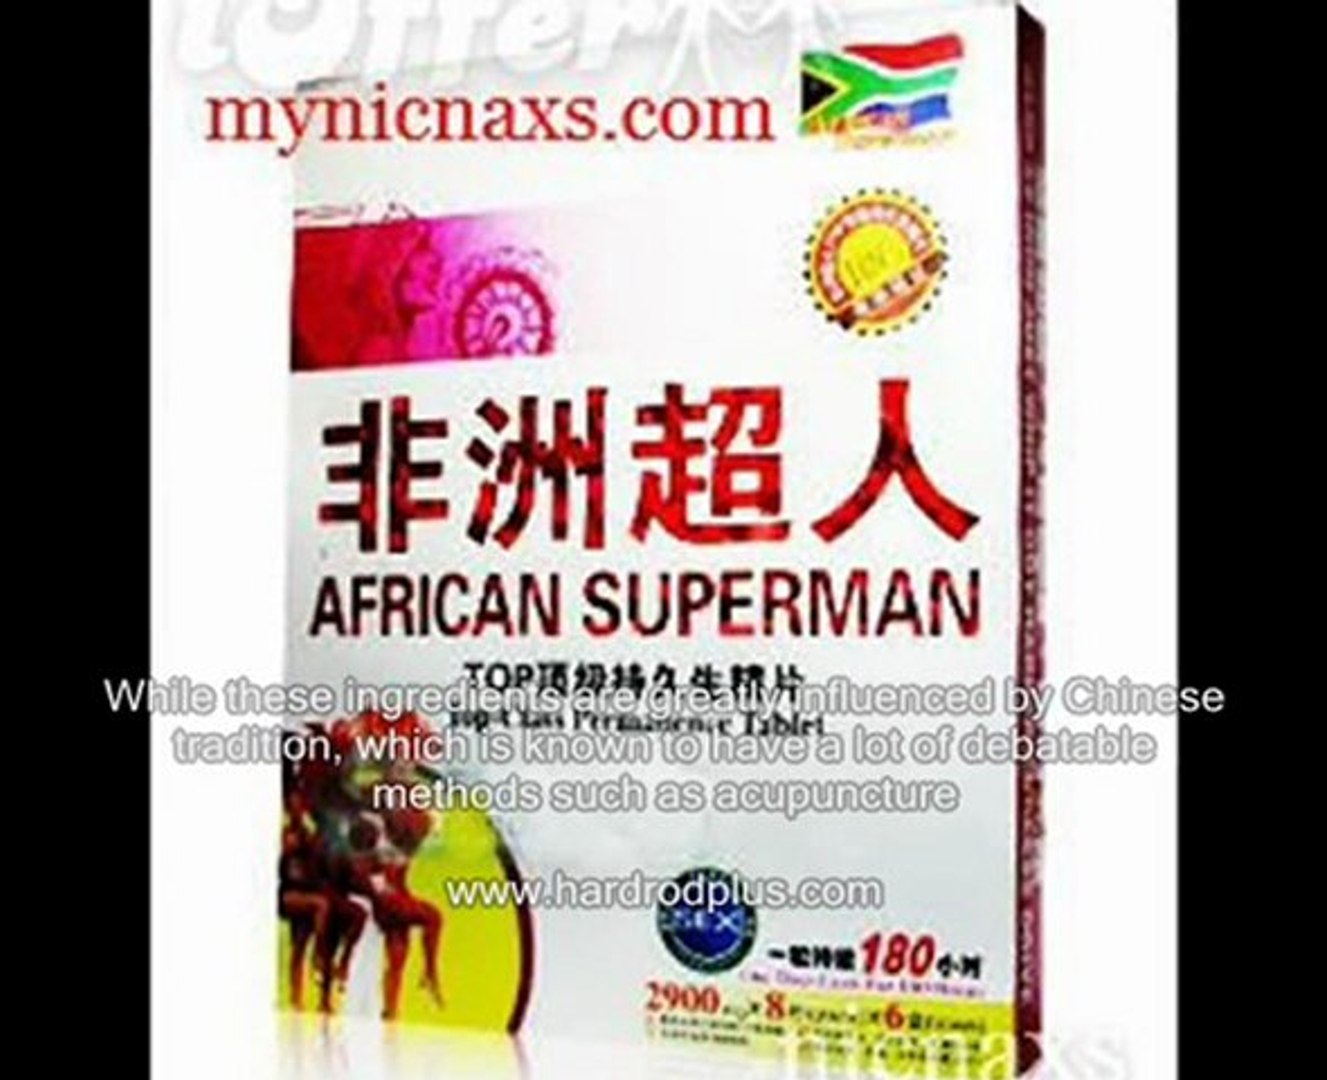 African Superman?